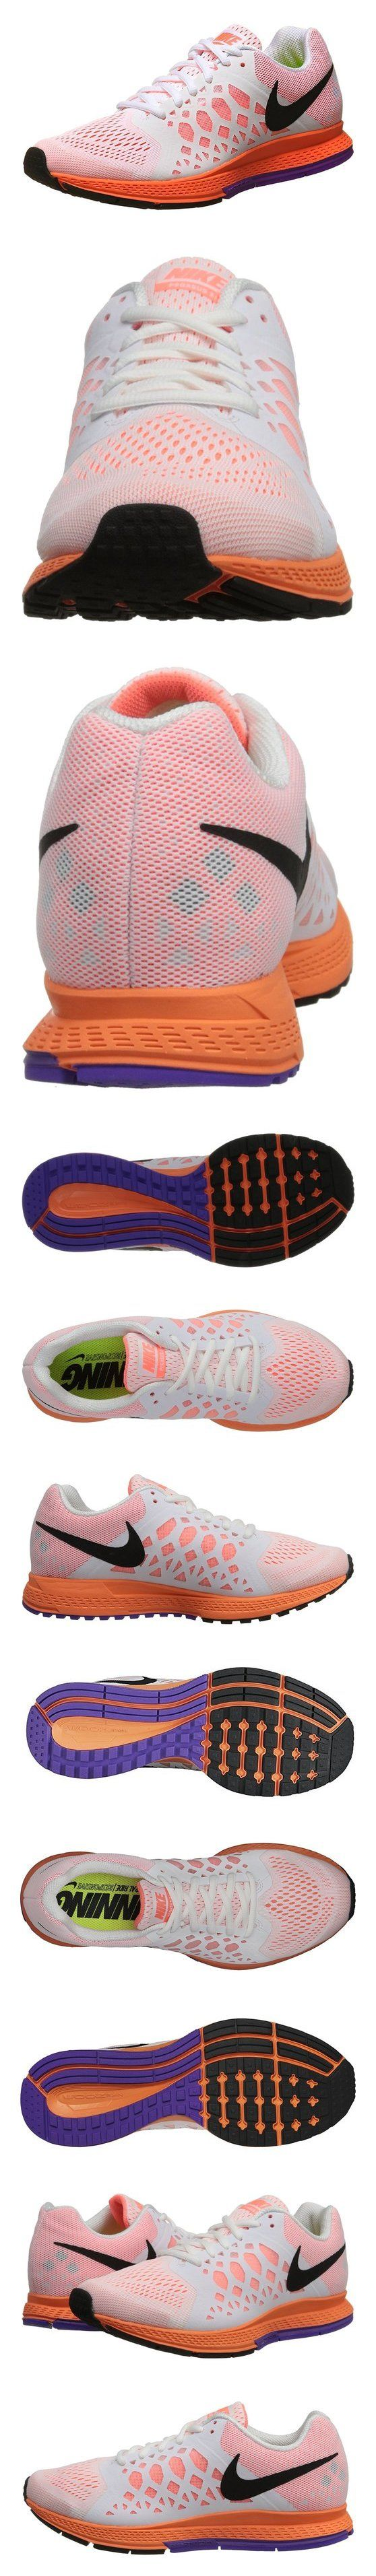 Nike Women's Zoom Pegasus 31 White/Black/Brght Mng/Hypr Grp Running Shoe 8 Women US #shoes #nike